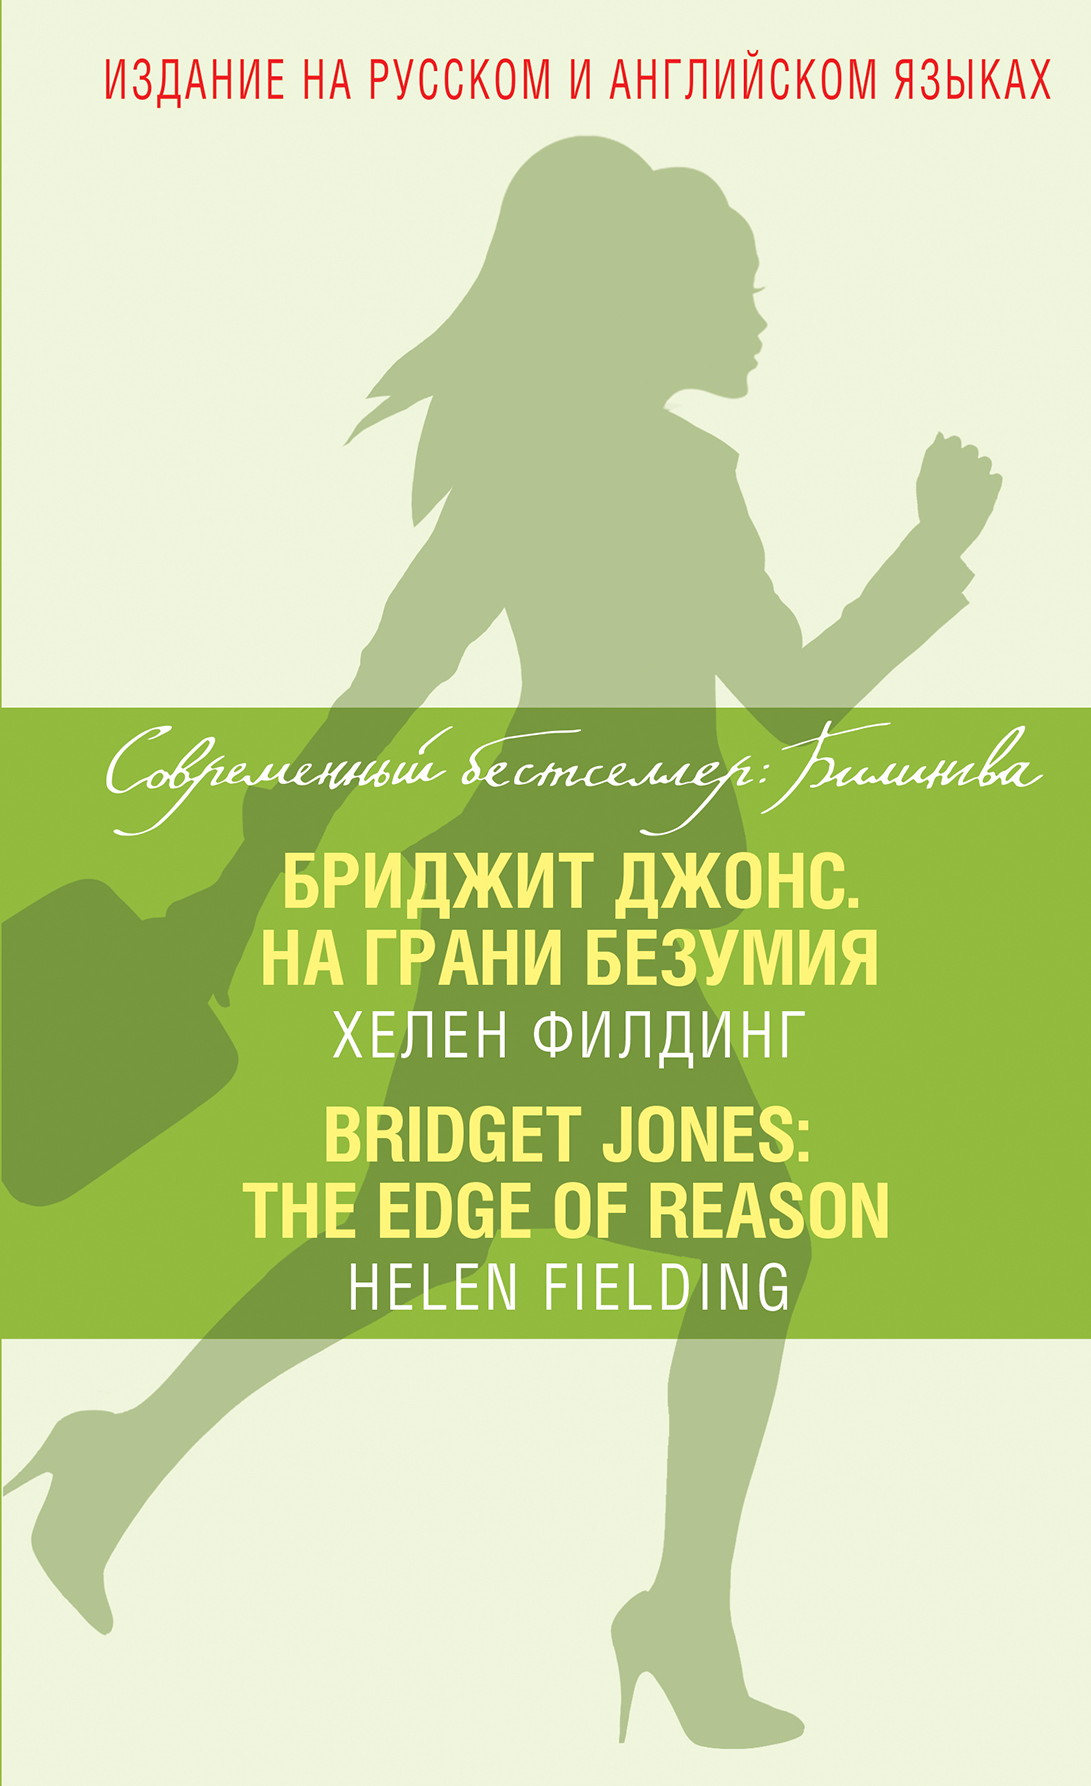 Бриджит Джонс. На грани безумия = Bridget Jones: The Edge of Reason ( Филдинг Х.  )